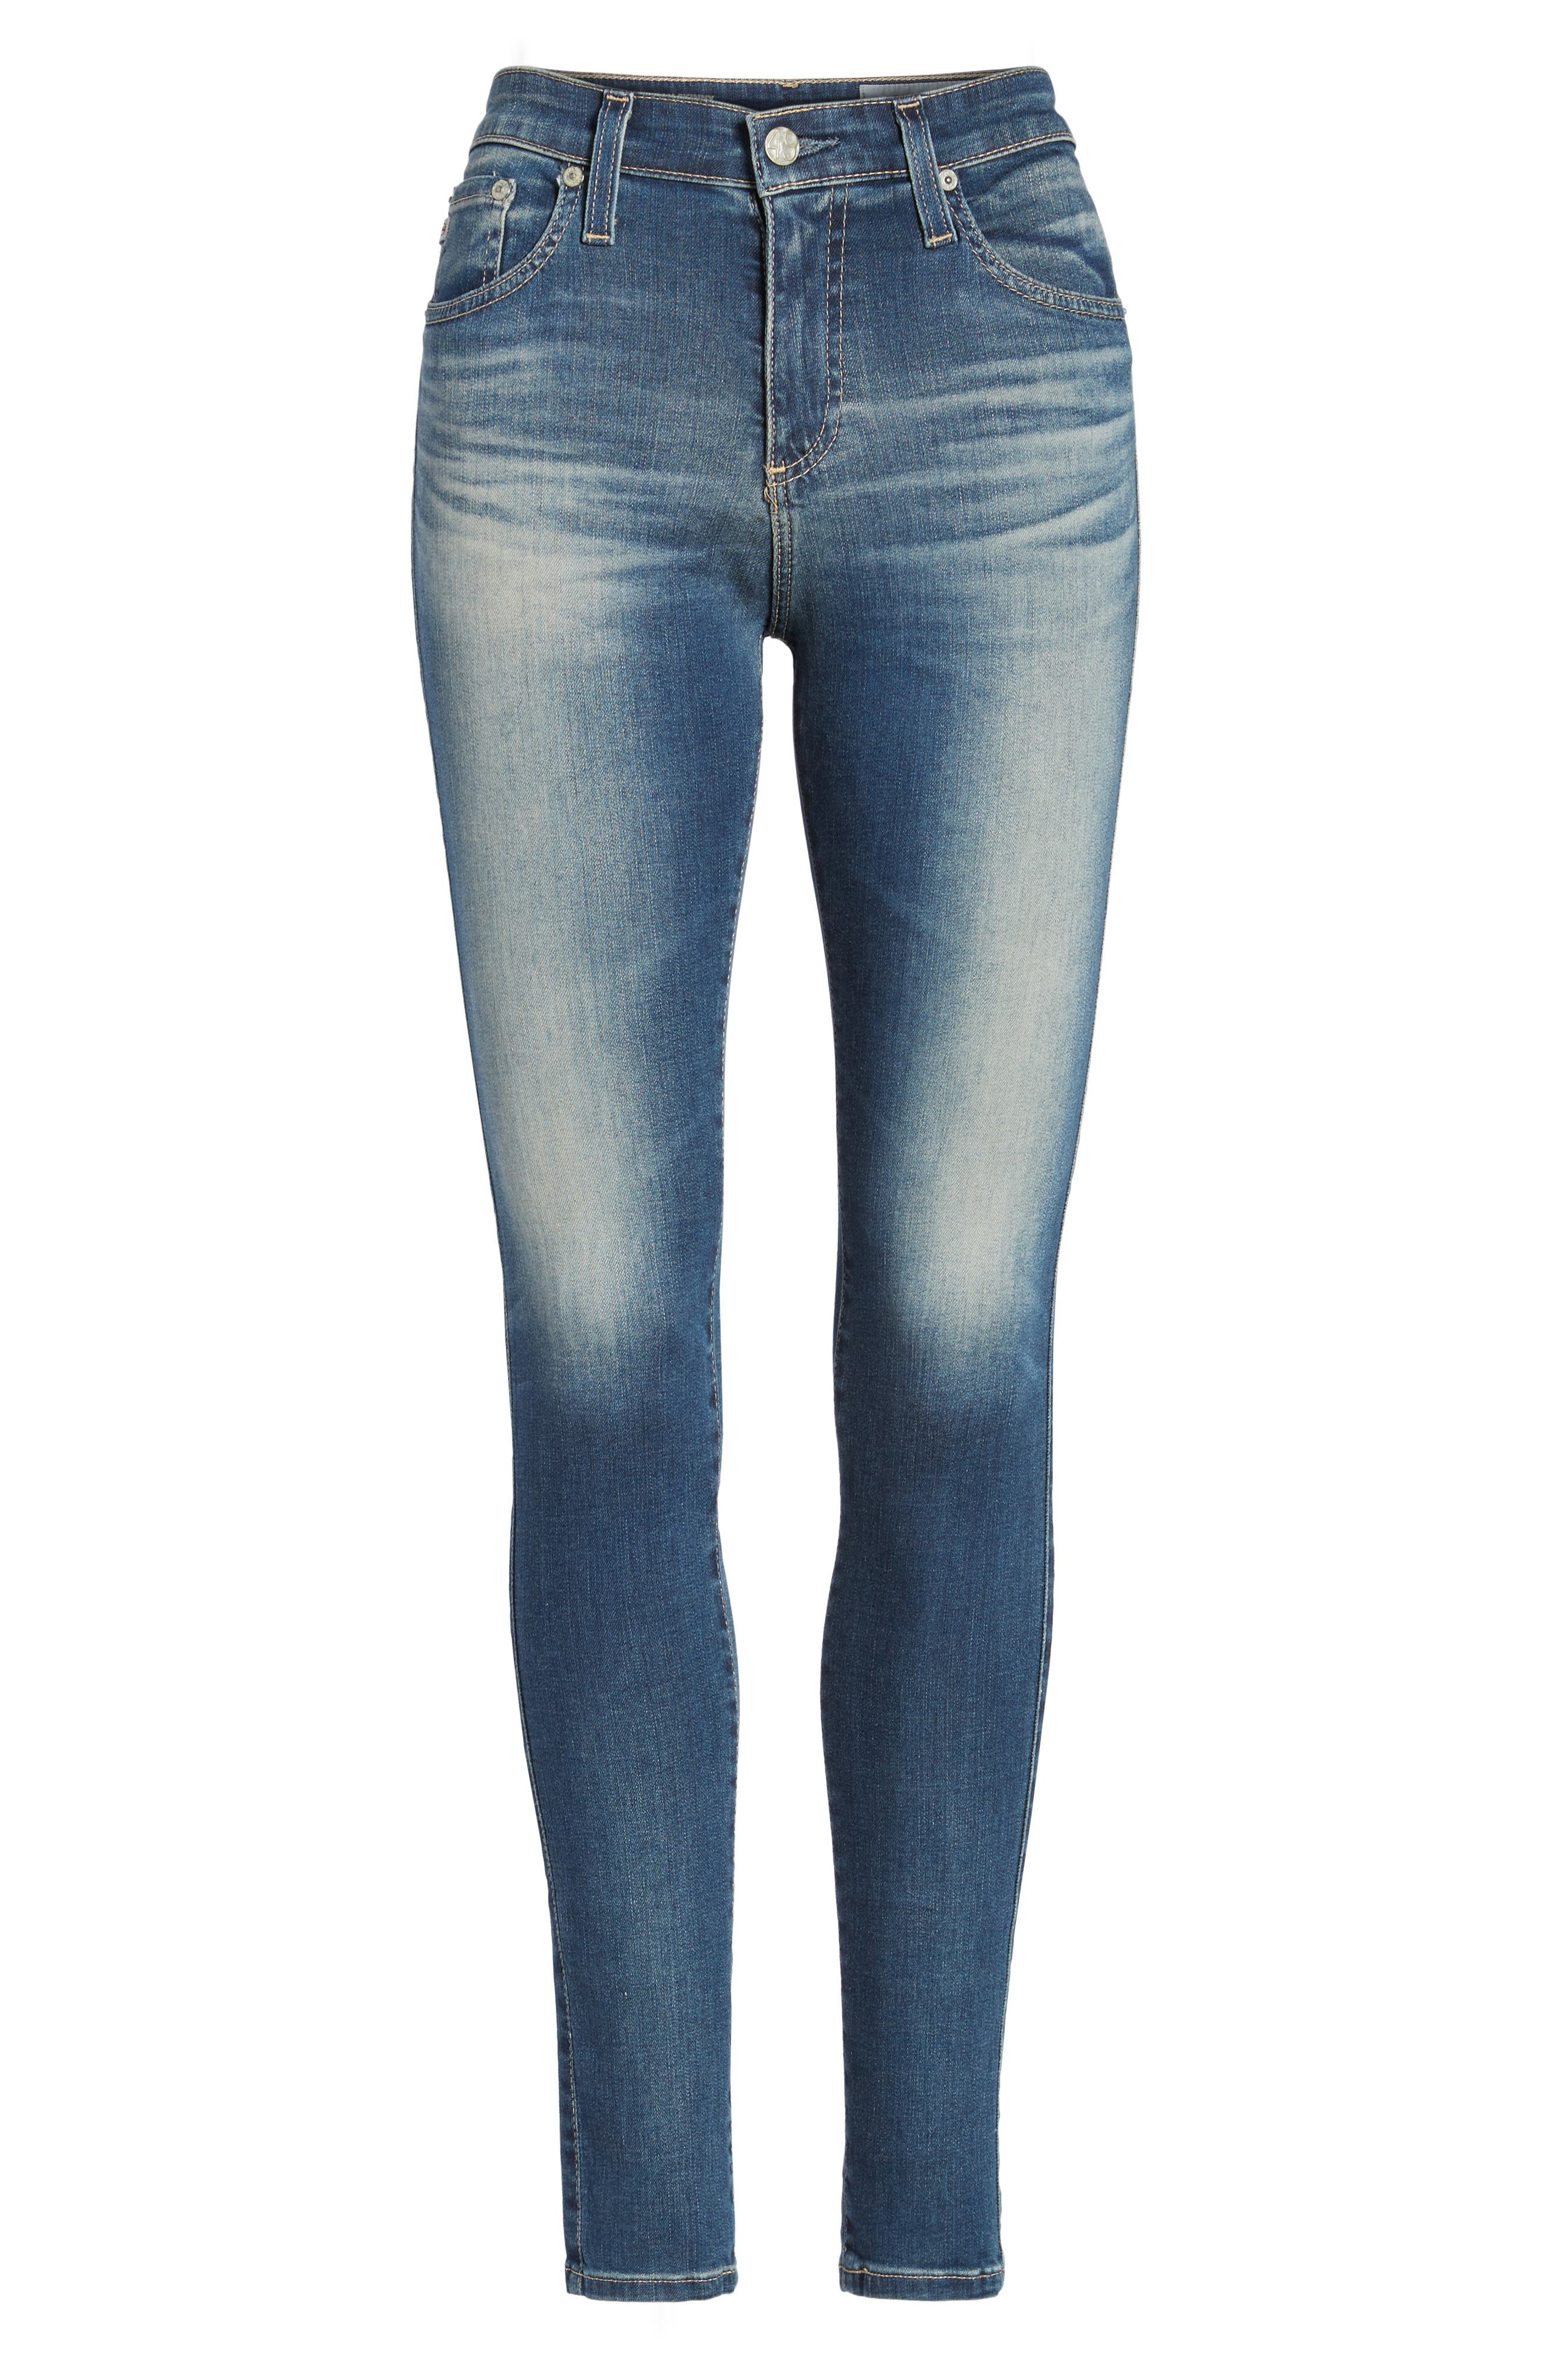 'The Farrah' High Rise Skinny Jeans,                             Alternate thumbnail 49, color,